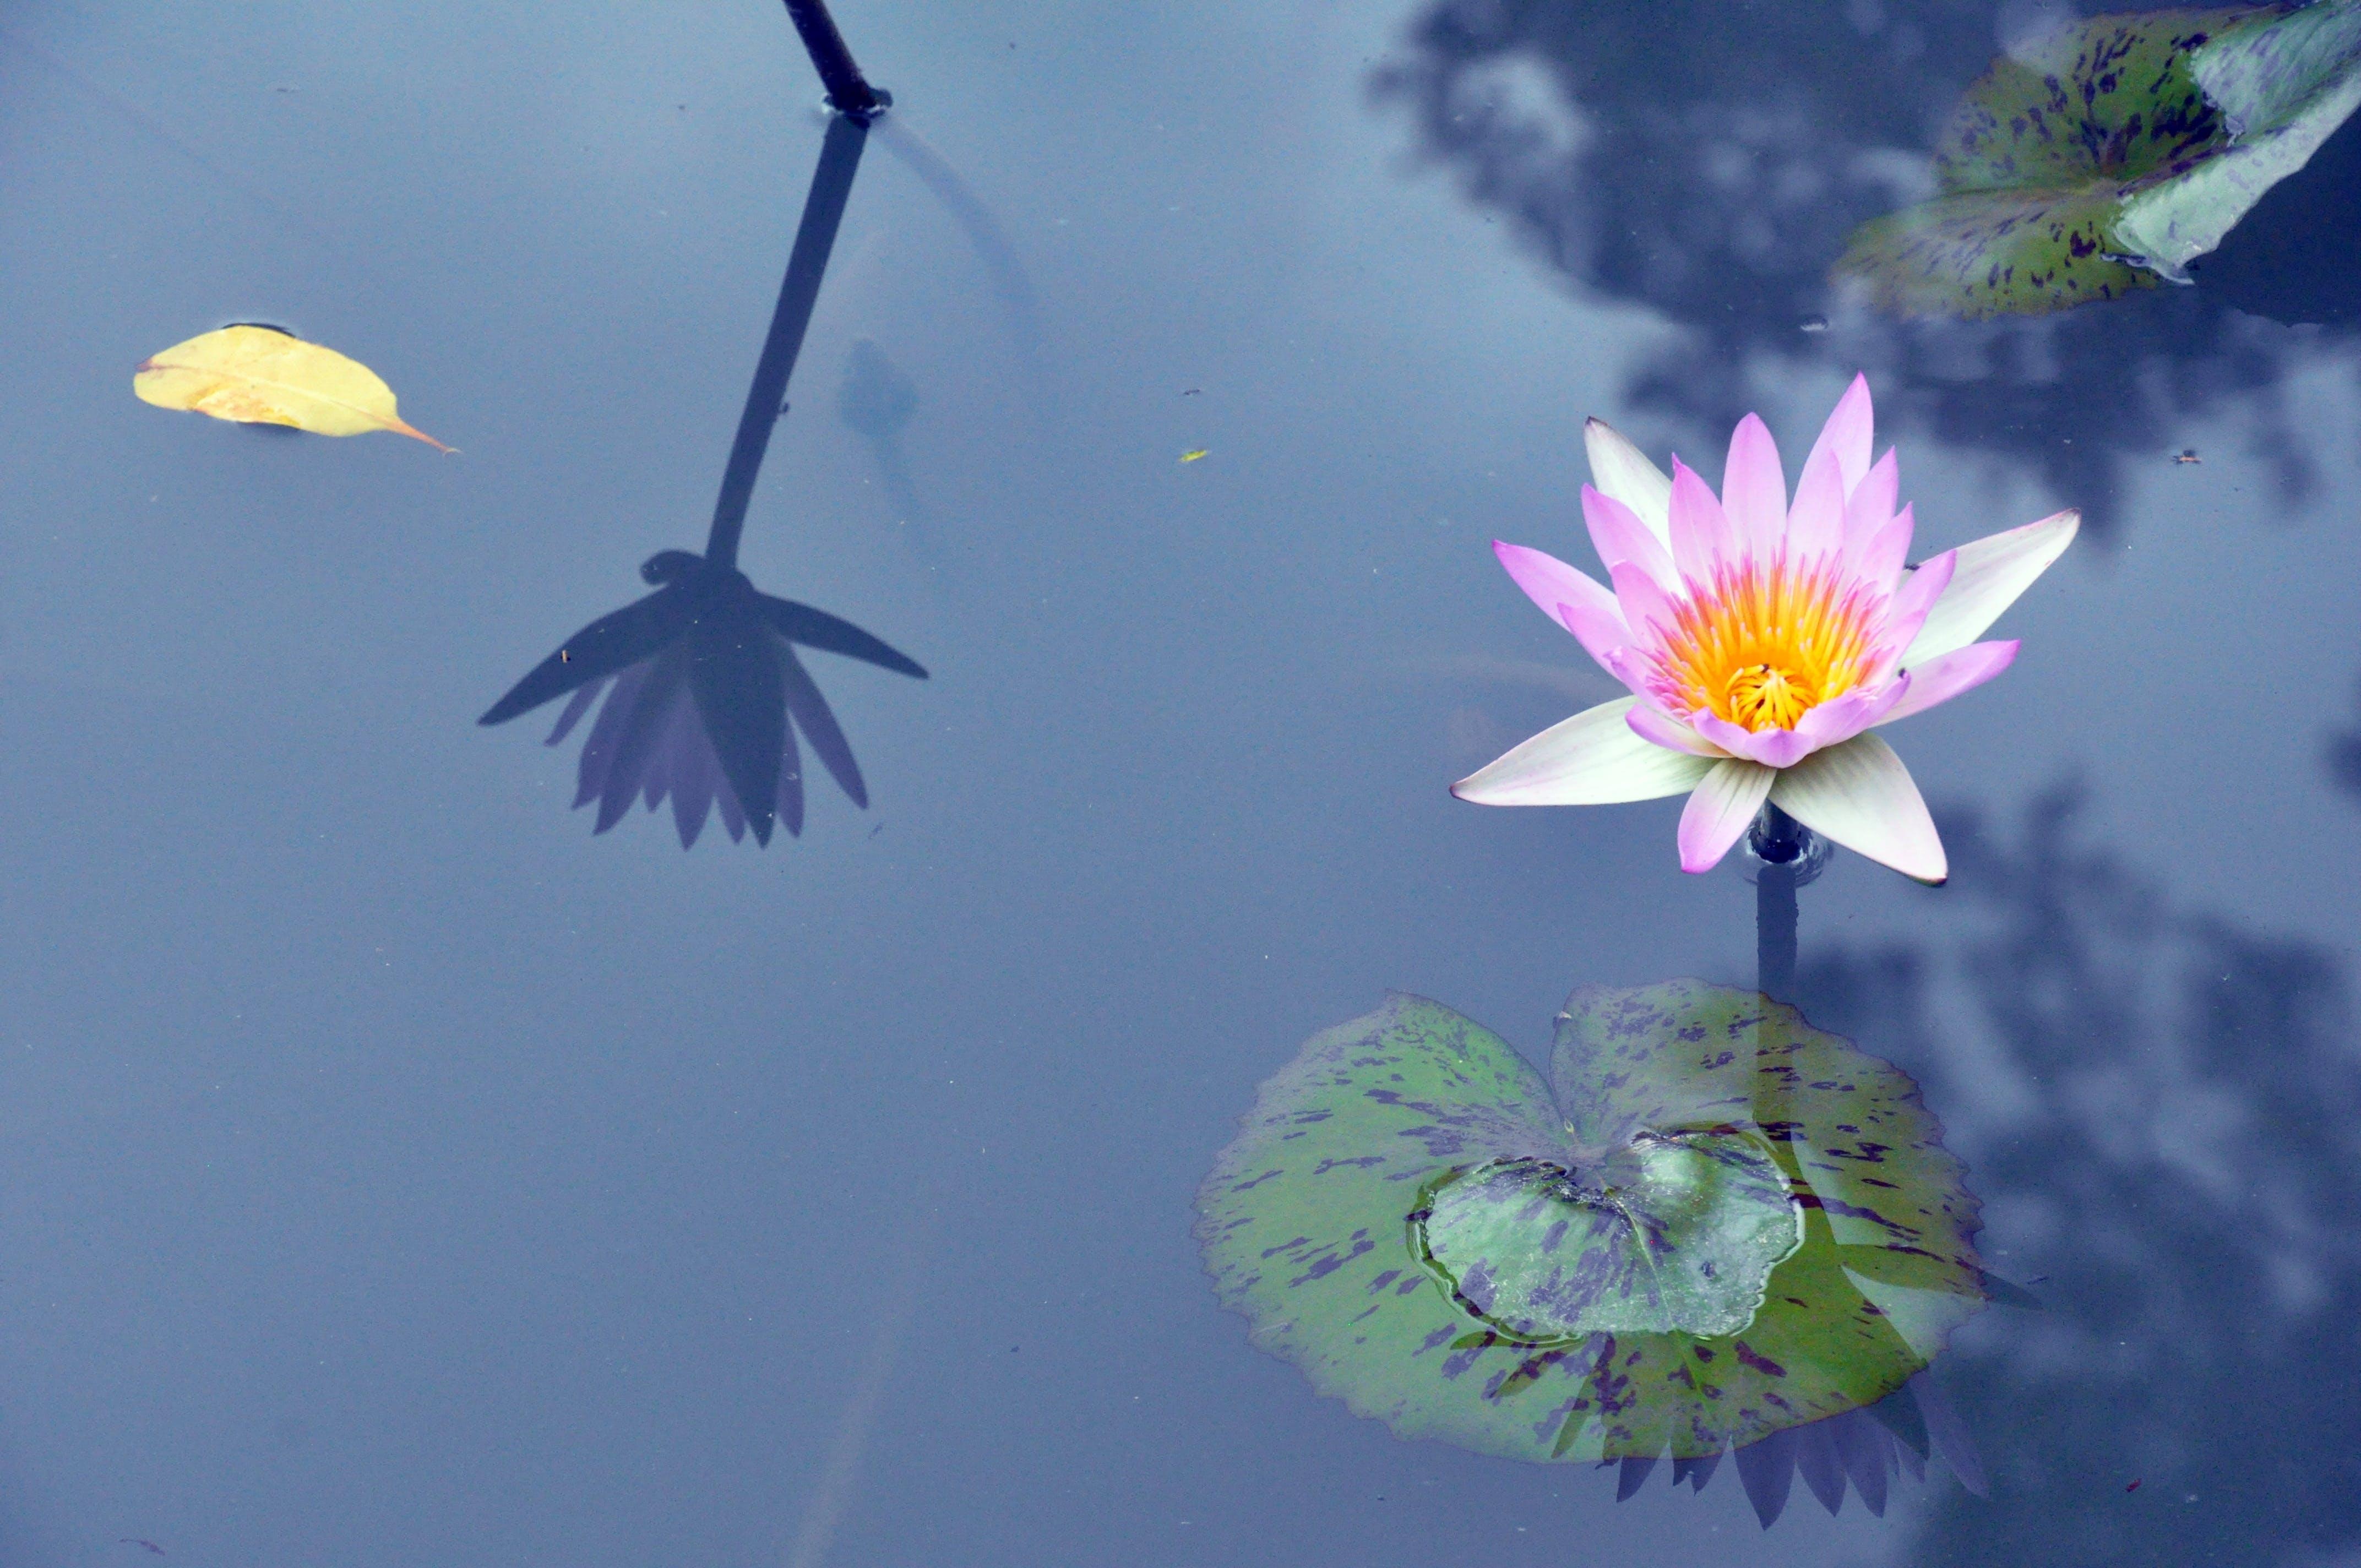 Free stock photo of nature, water, summer, purple